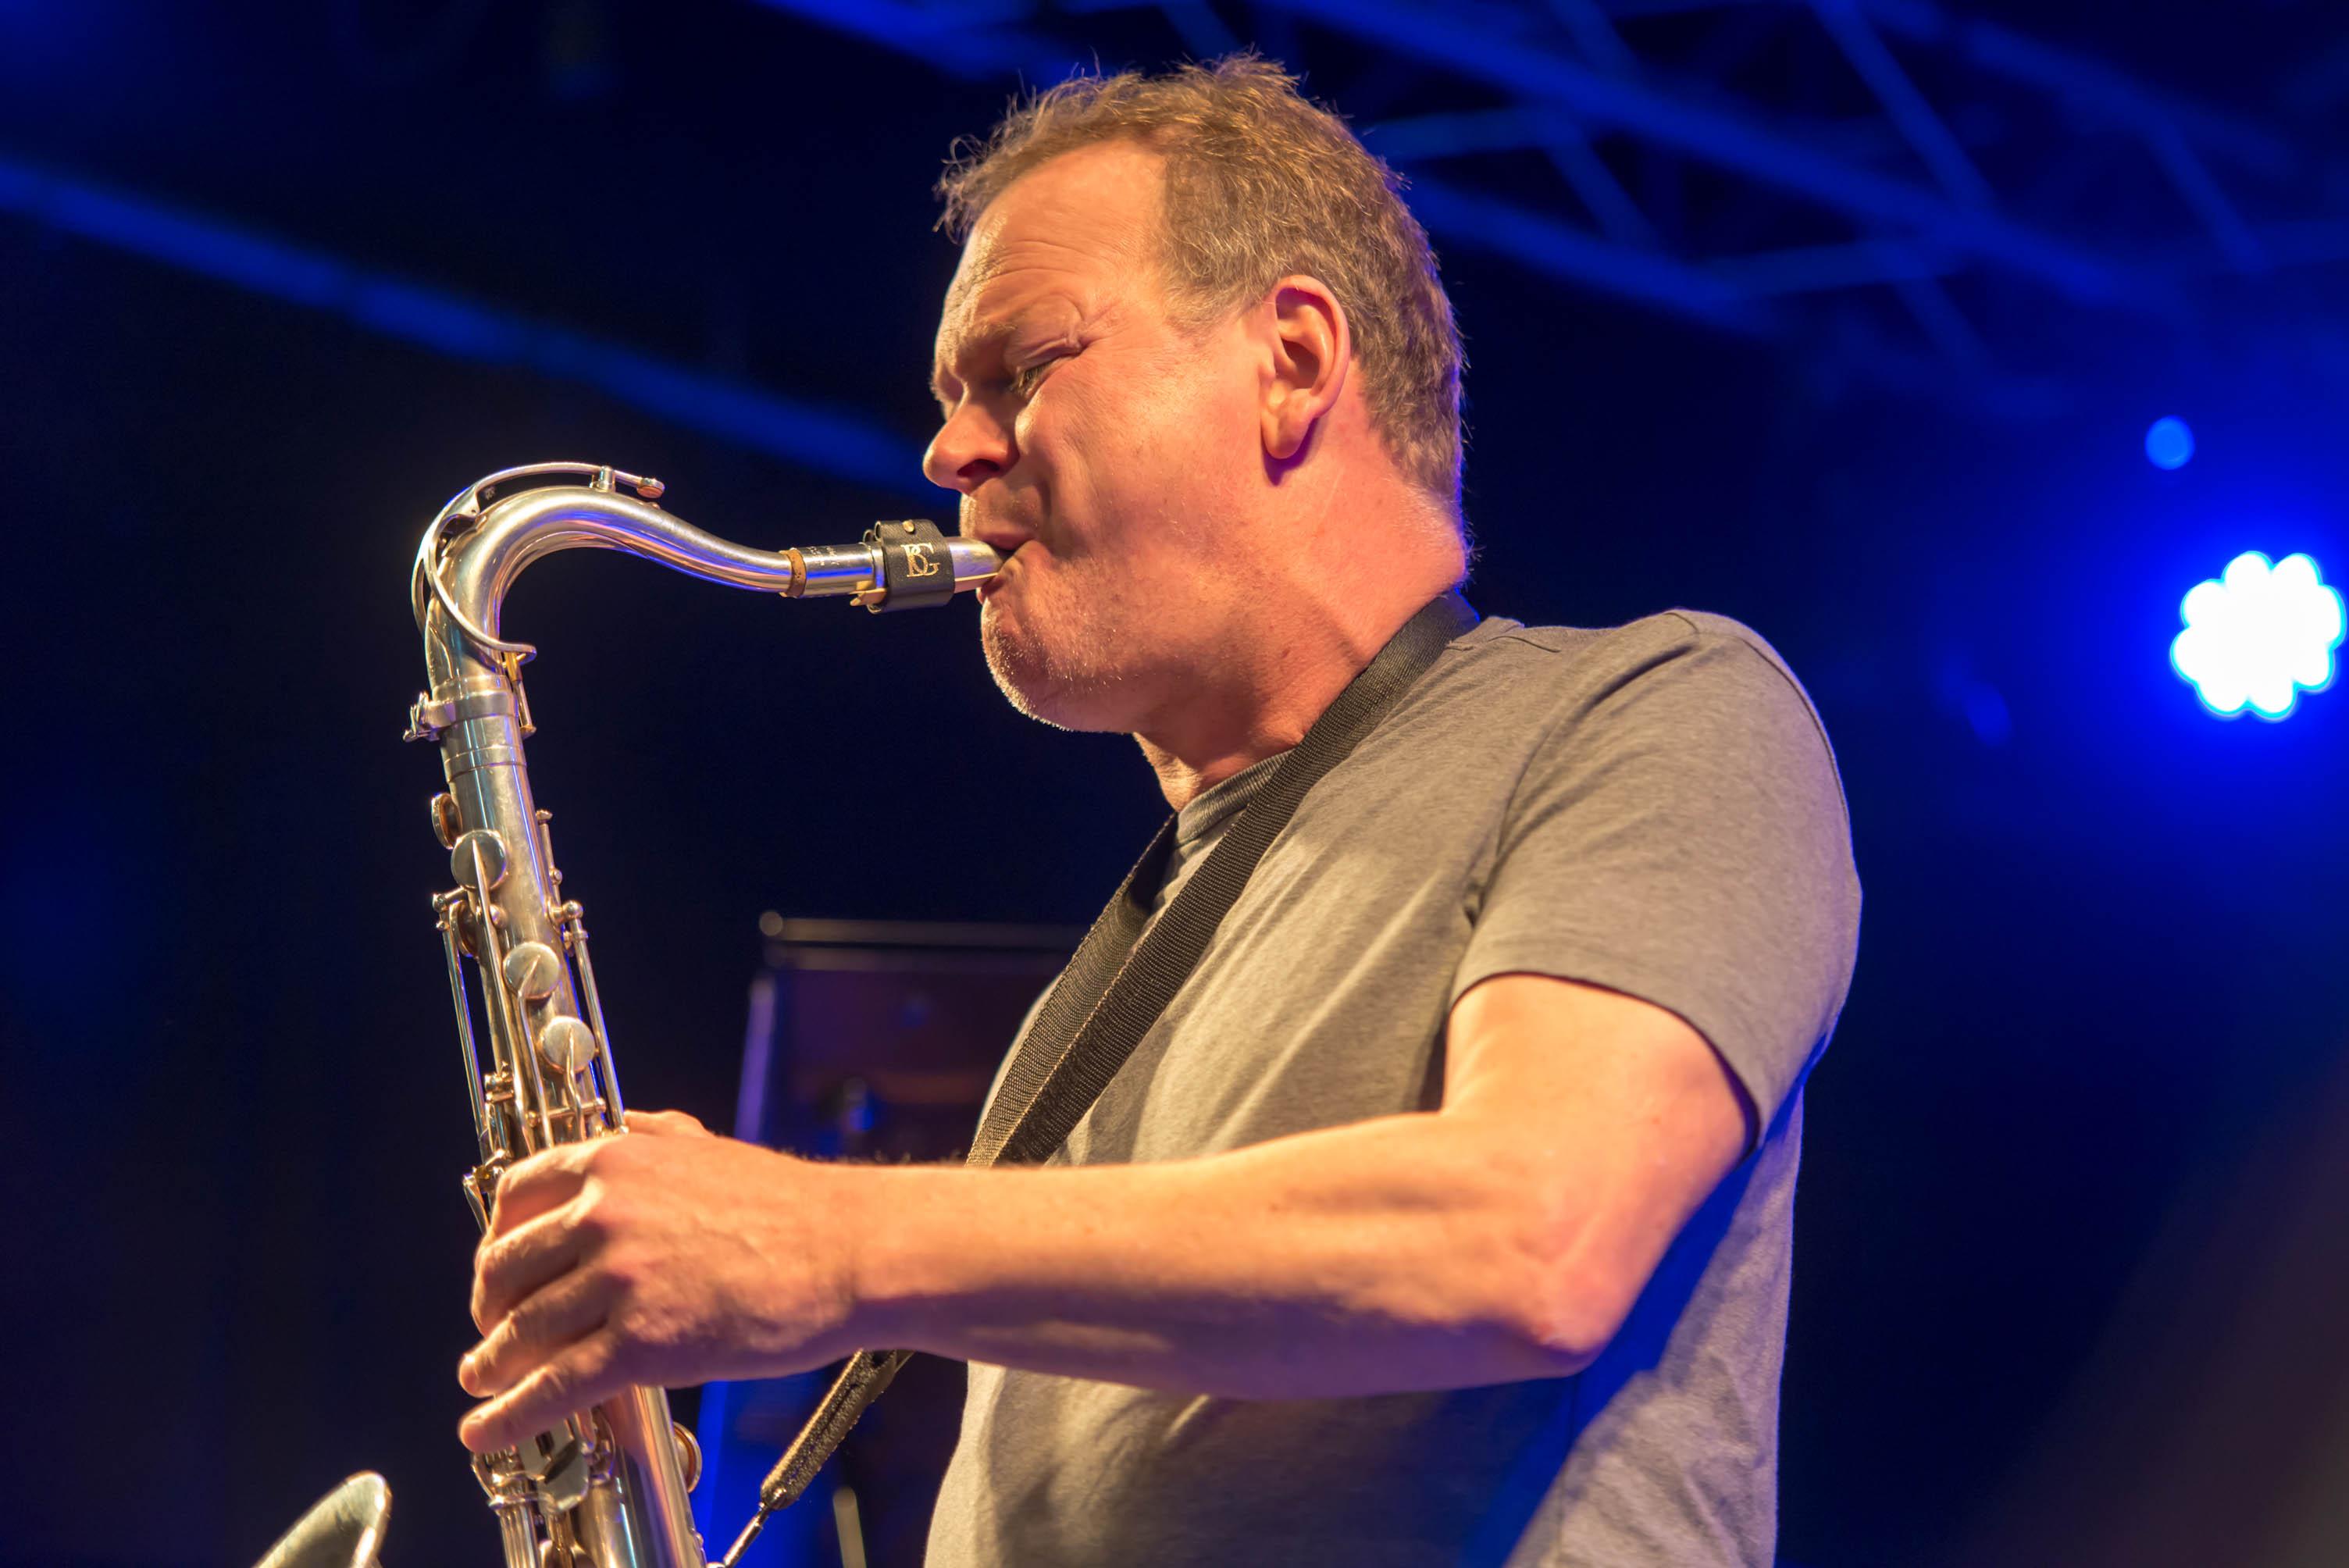 Eple Trio with Karl Seglem, 2012 Kongsberg Jaz Festival